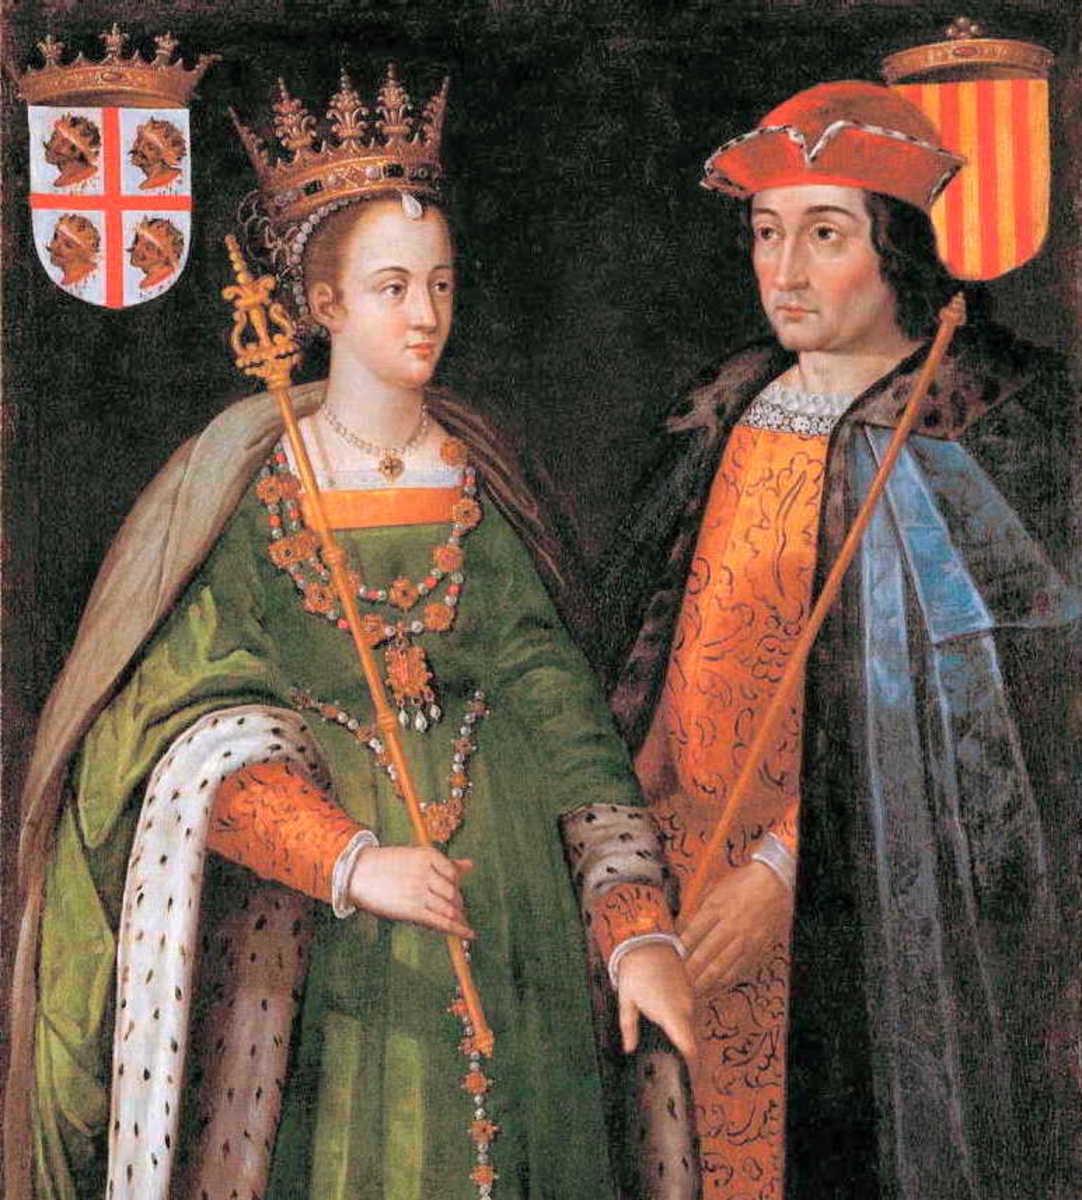 Count of Barcelona and Countess of Aragon